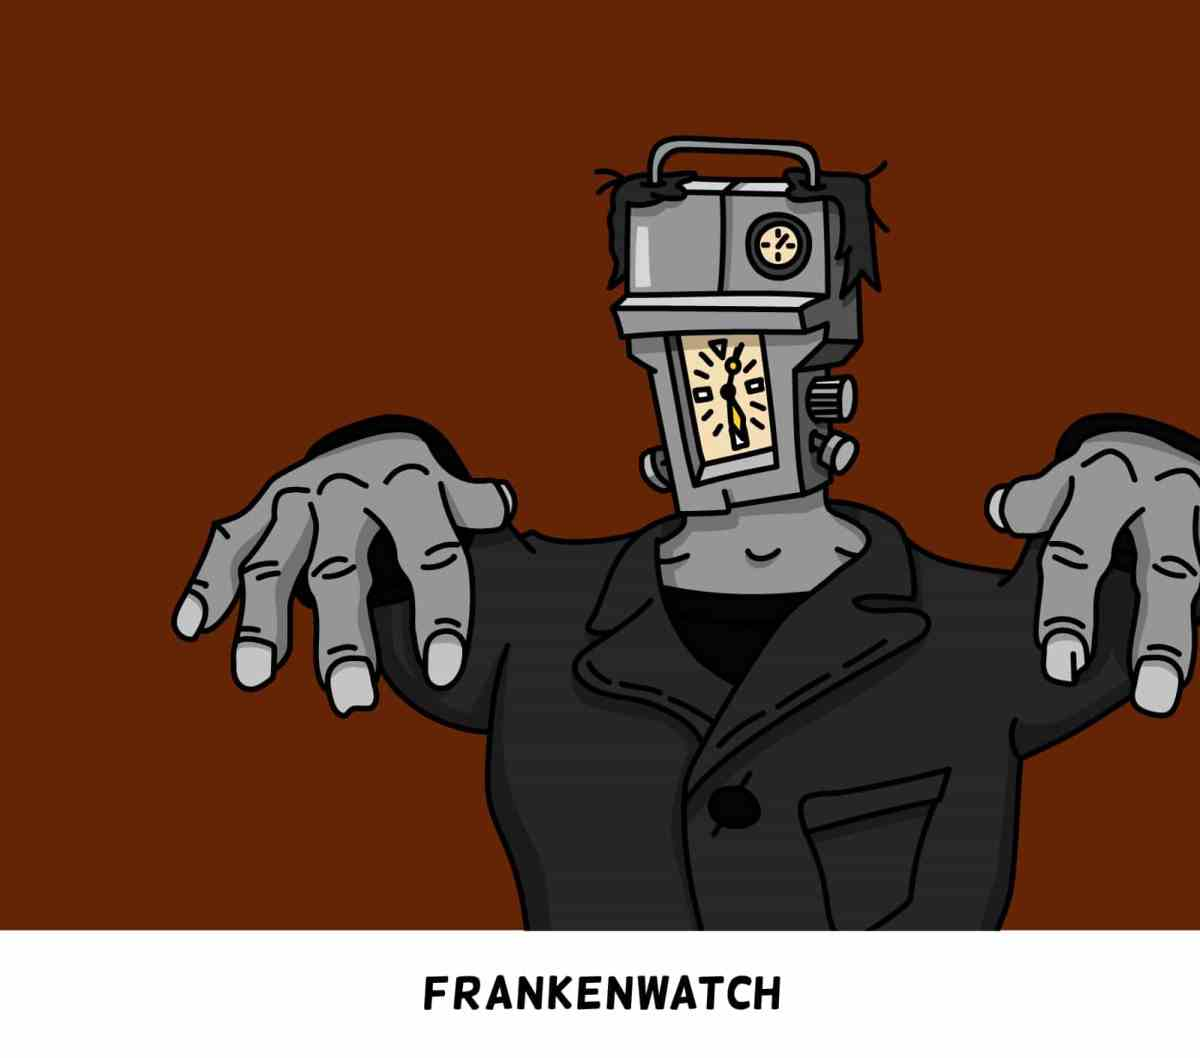 Frankenwatch